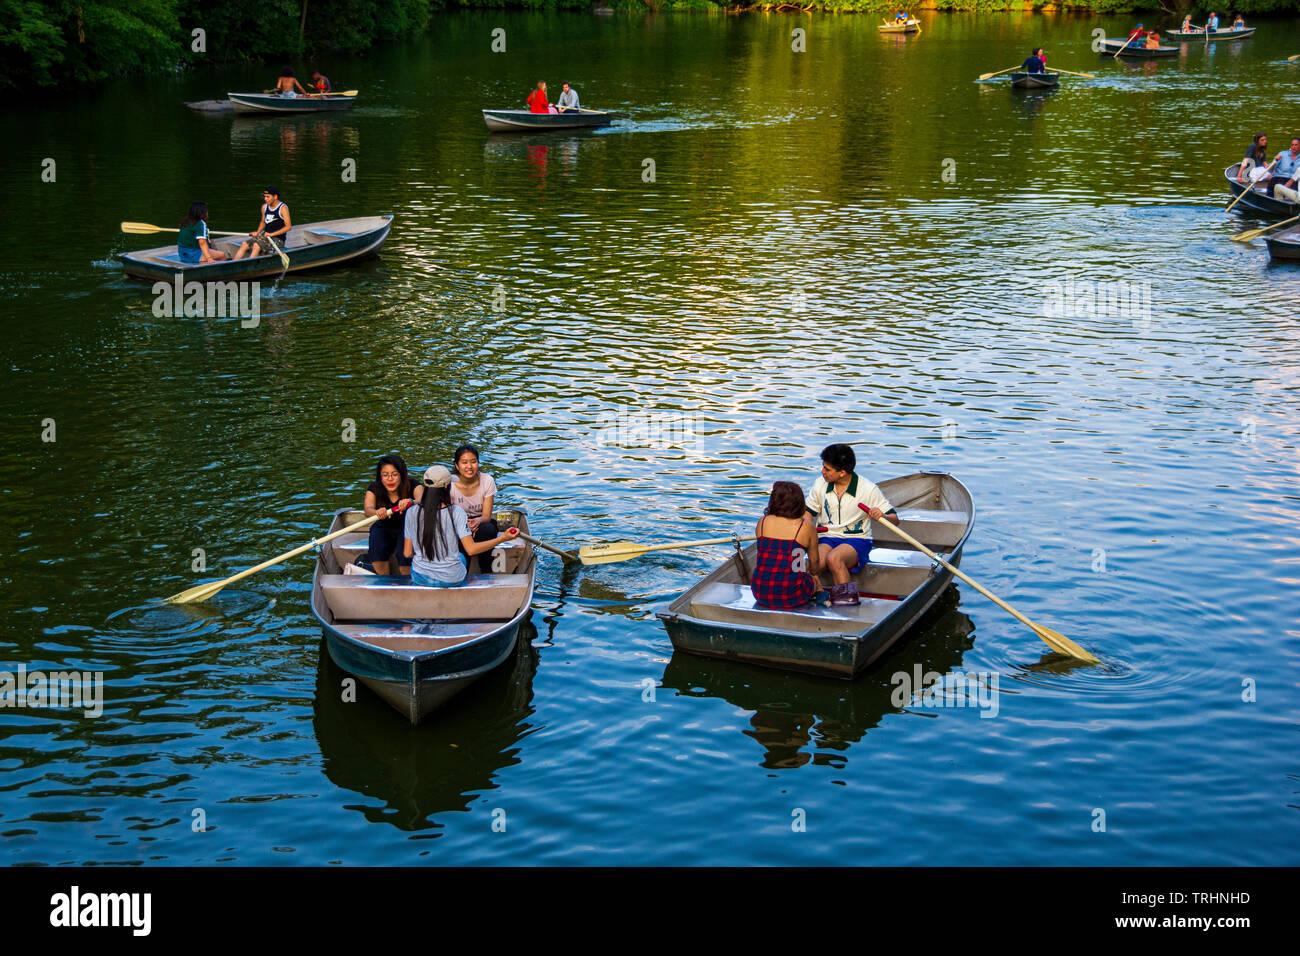 New York Central Park Boats Lake Stock Photos & New York